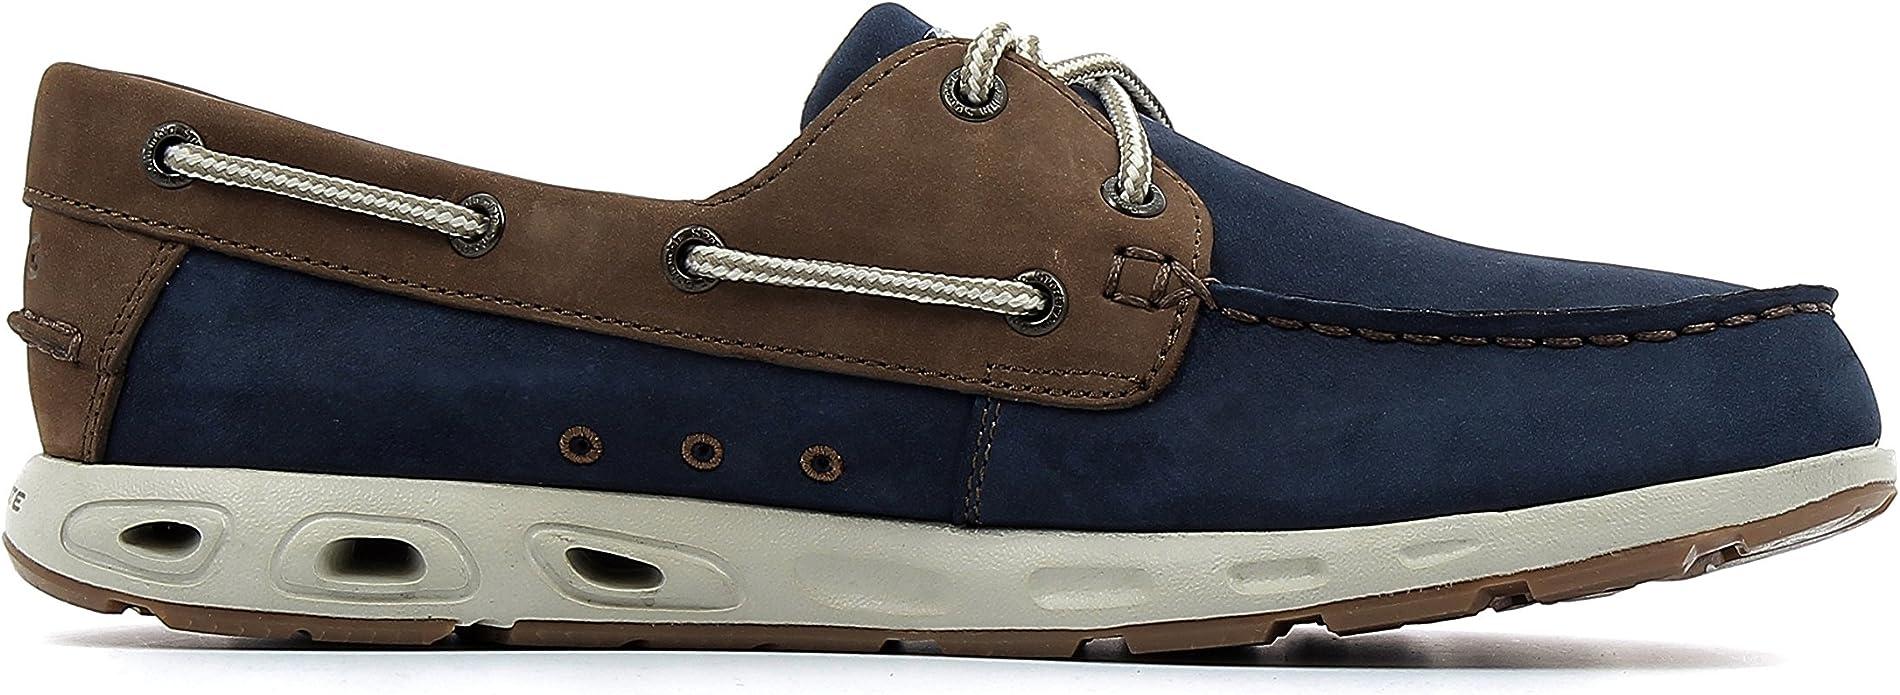 Columbia Bonehead Vent Leather PFG, Chaussures Bateau Homme